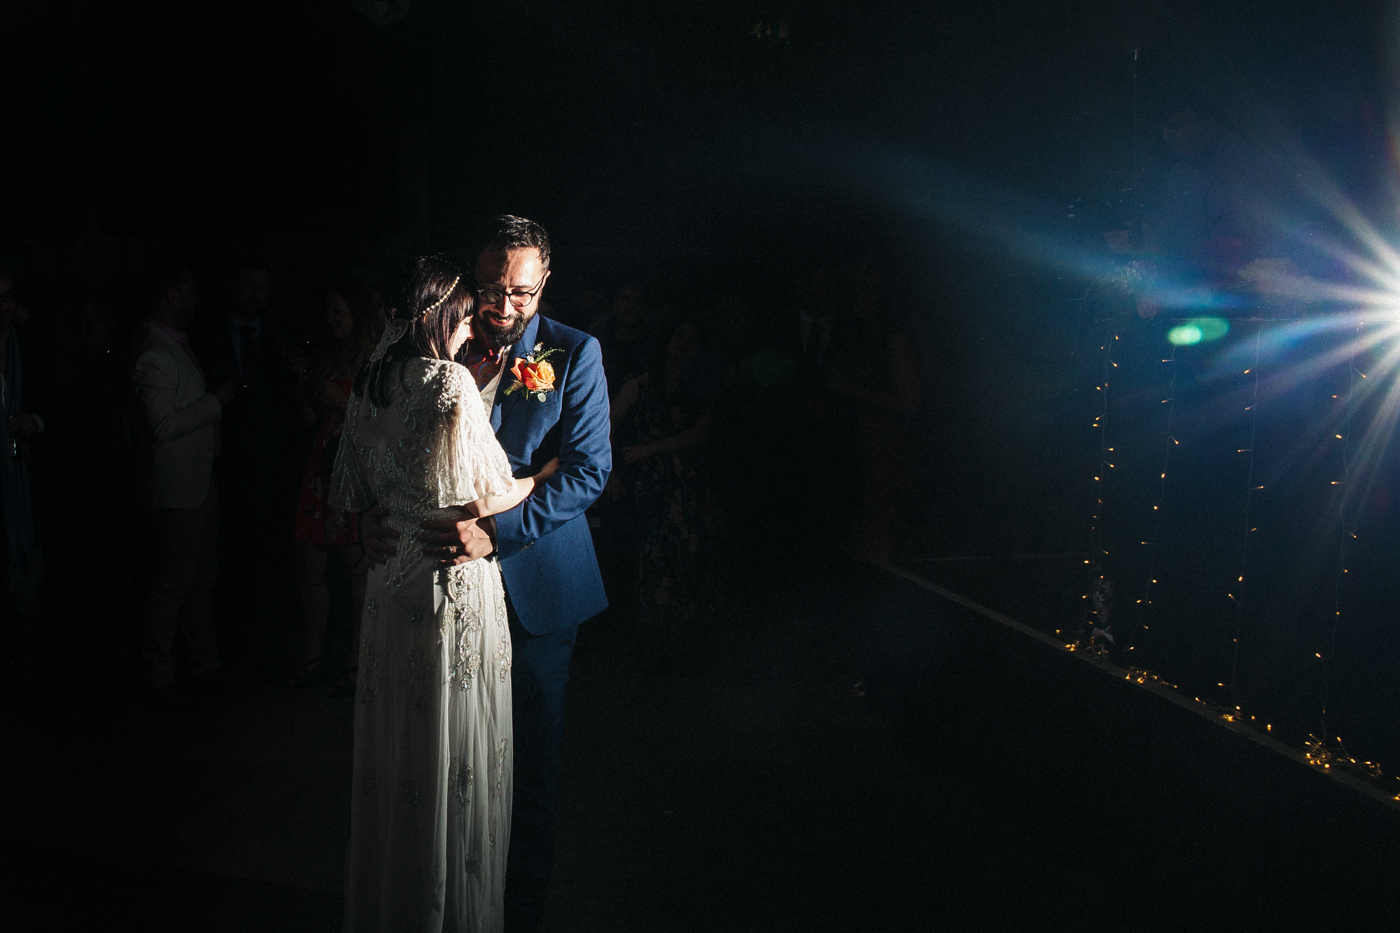 teesside-middlesbrough-north-east-wedding-photographer-creative-wedding-venues-0012.jpg